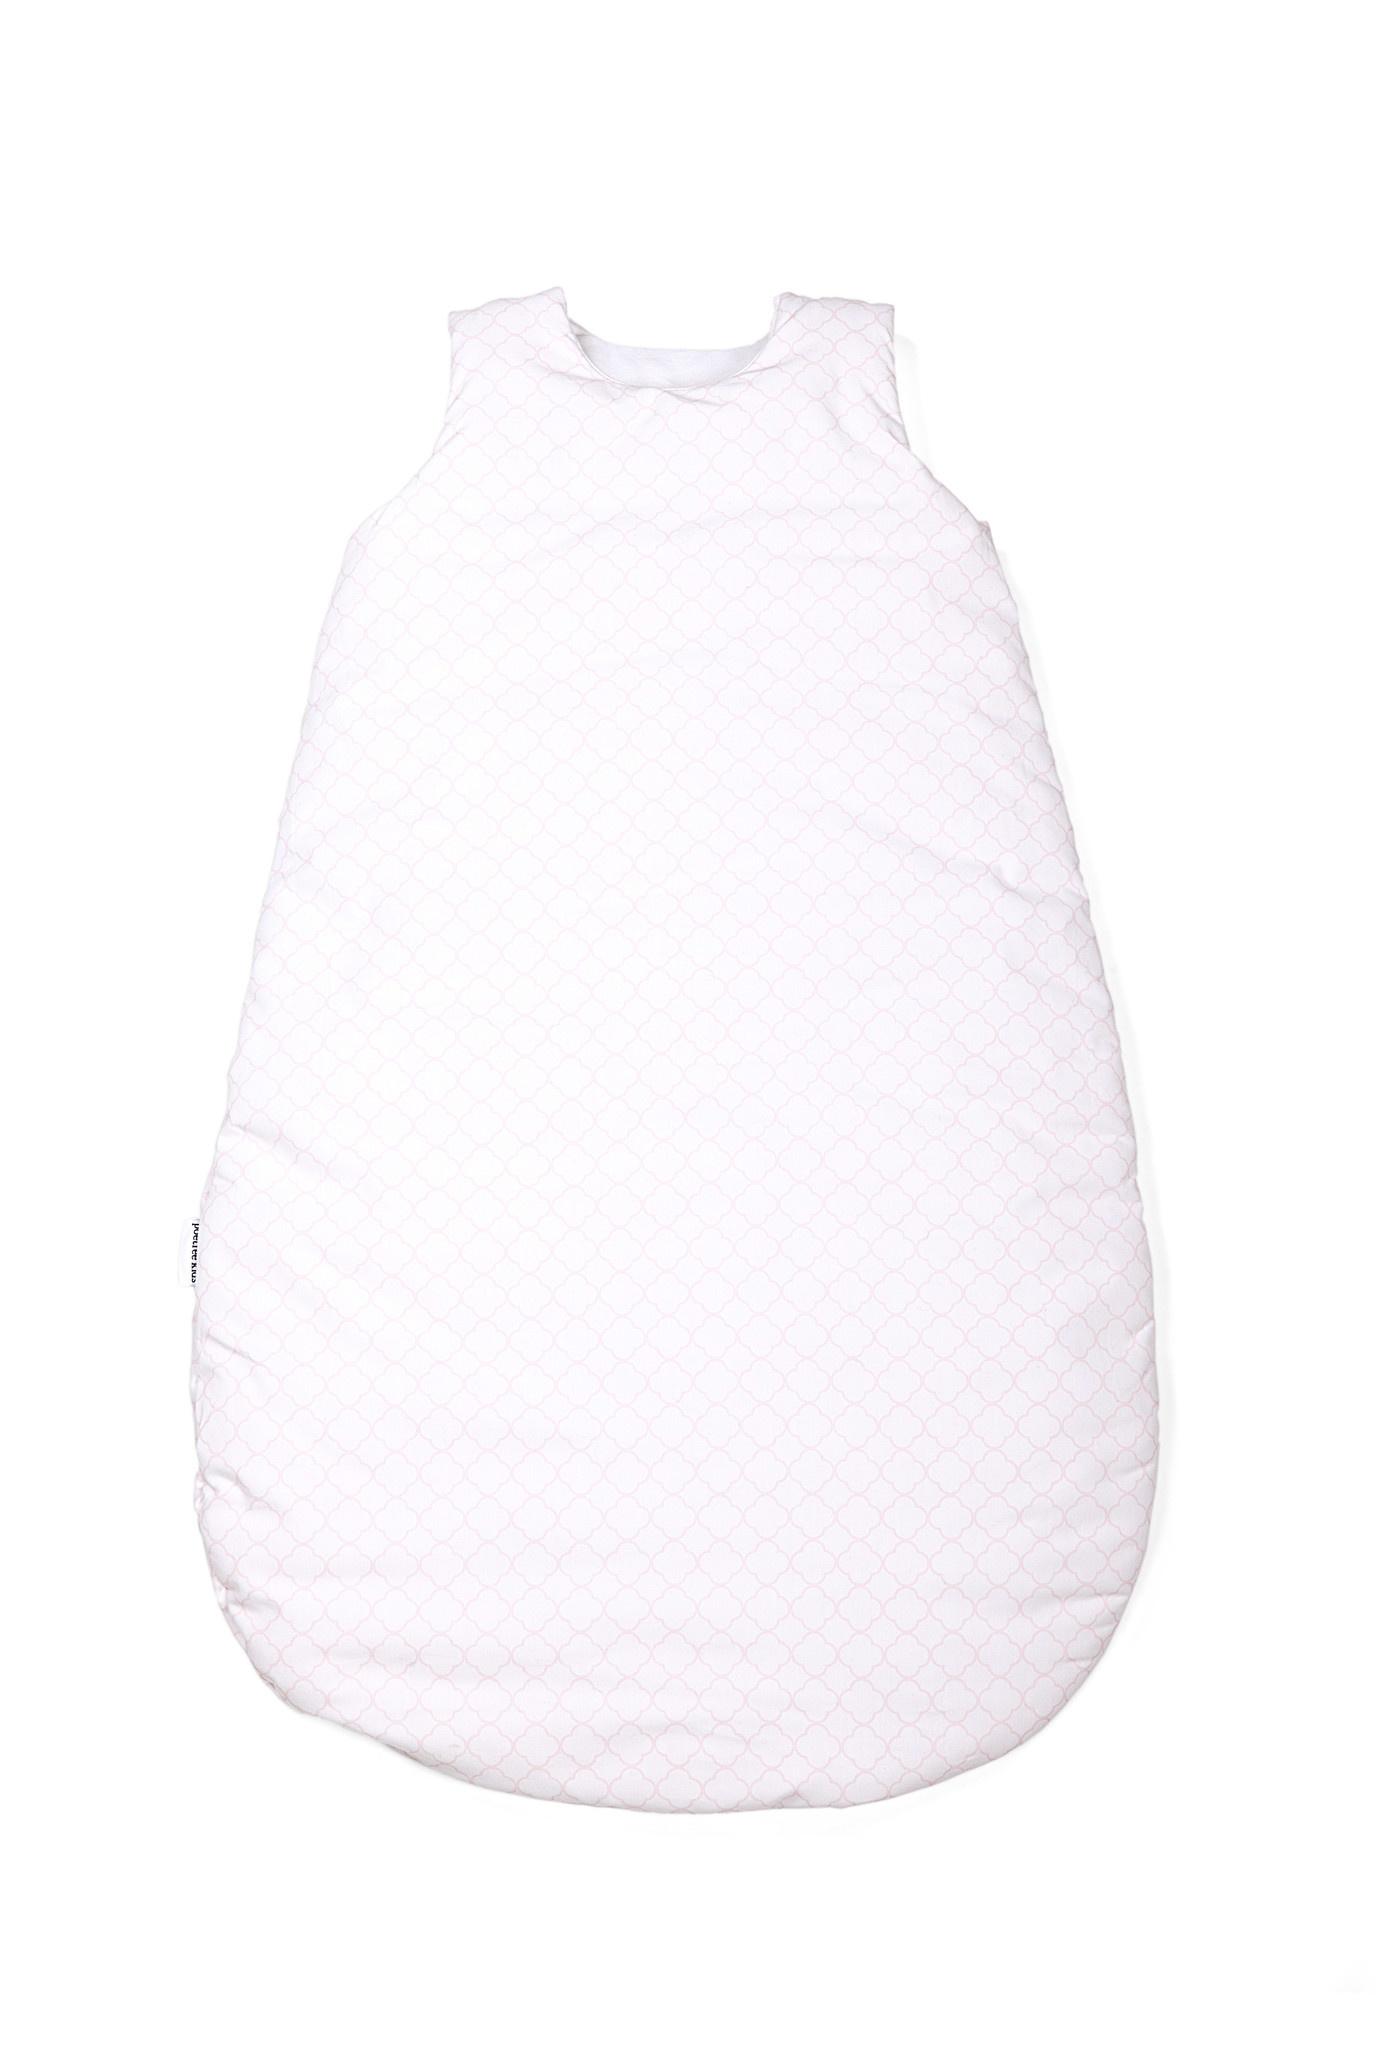 Sleepingbag 70cm Valencia-7